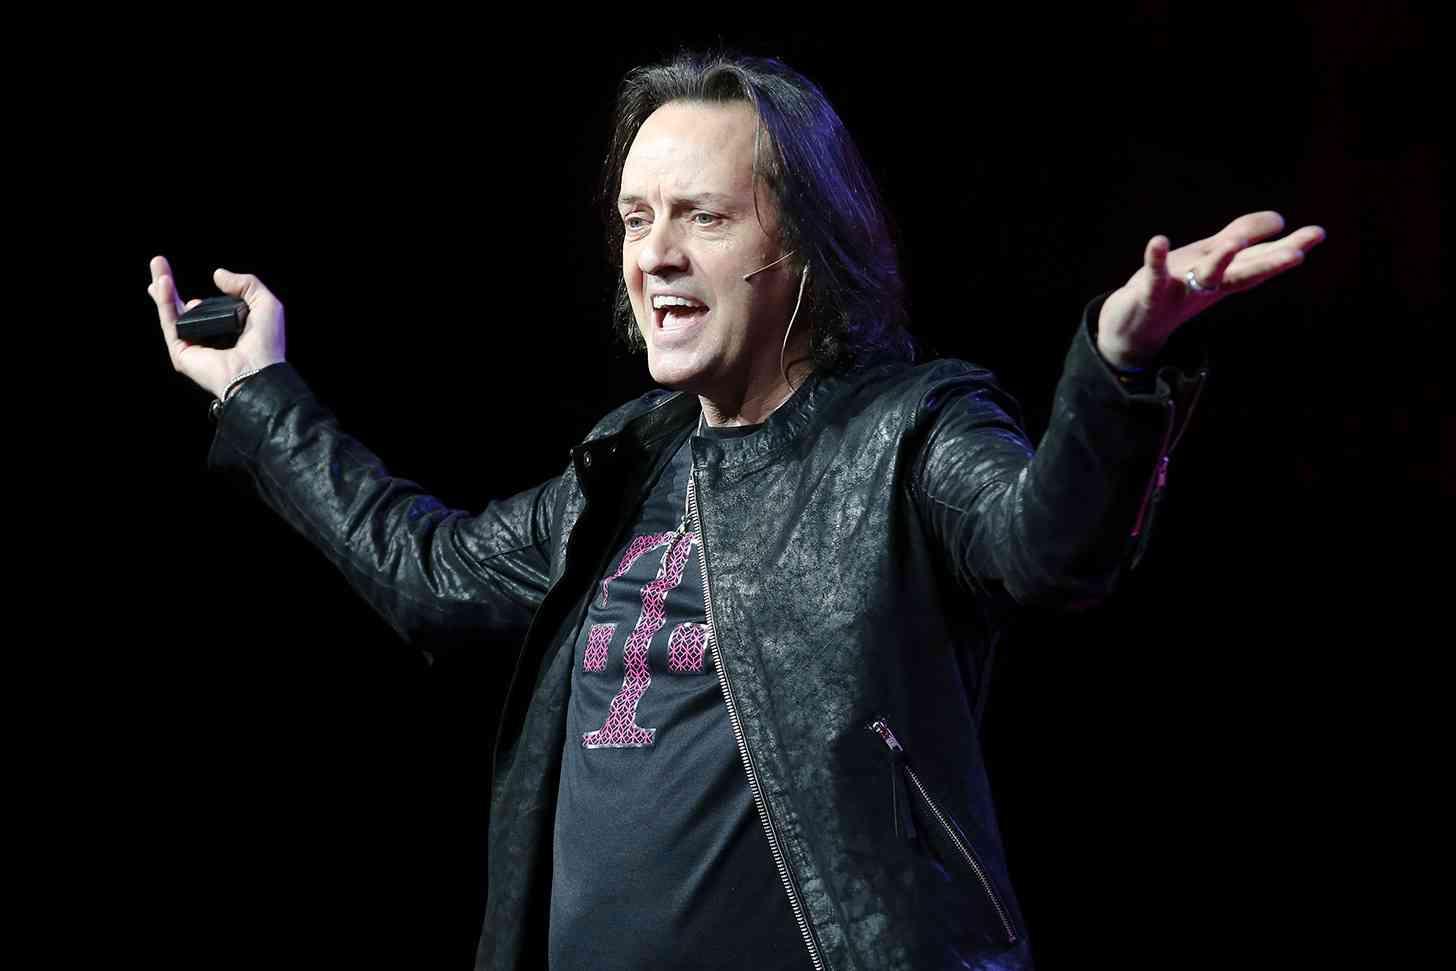 T-Mobile CEO John Legere event